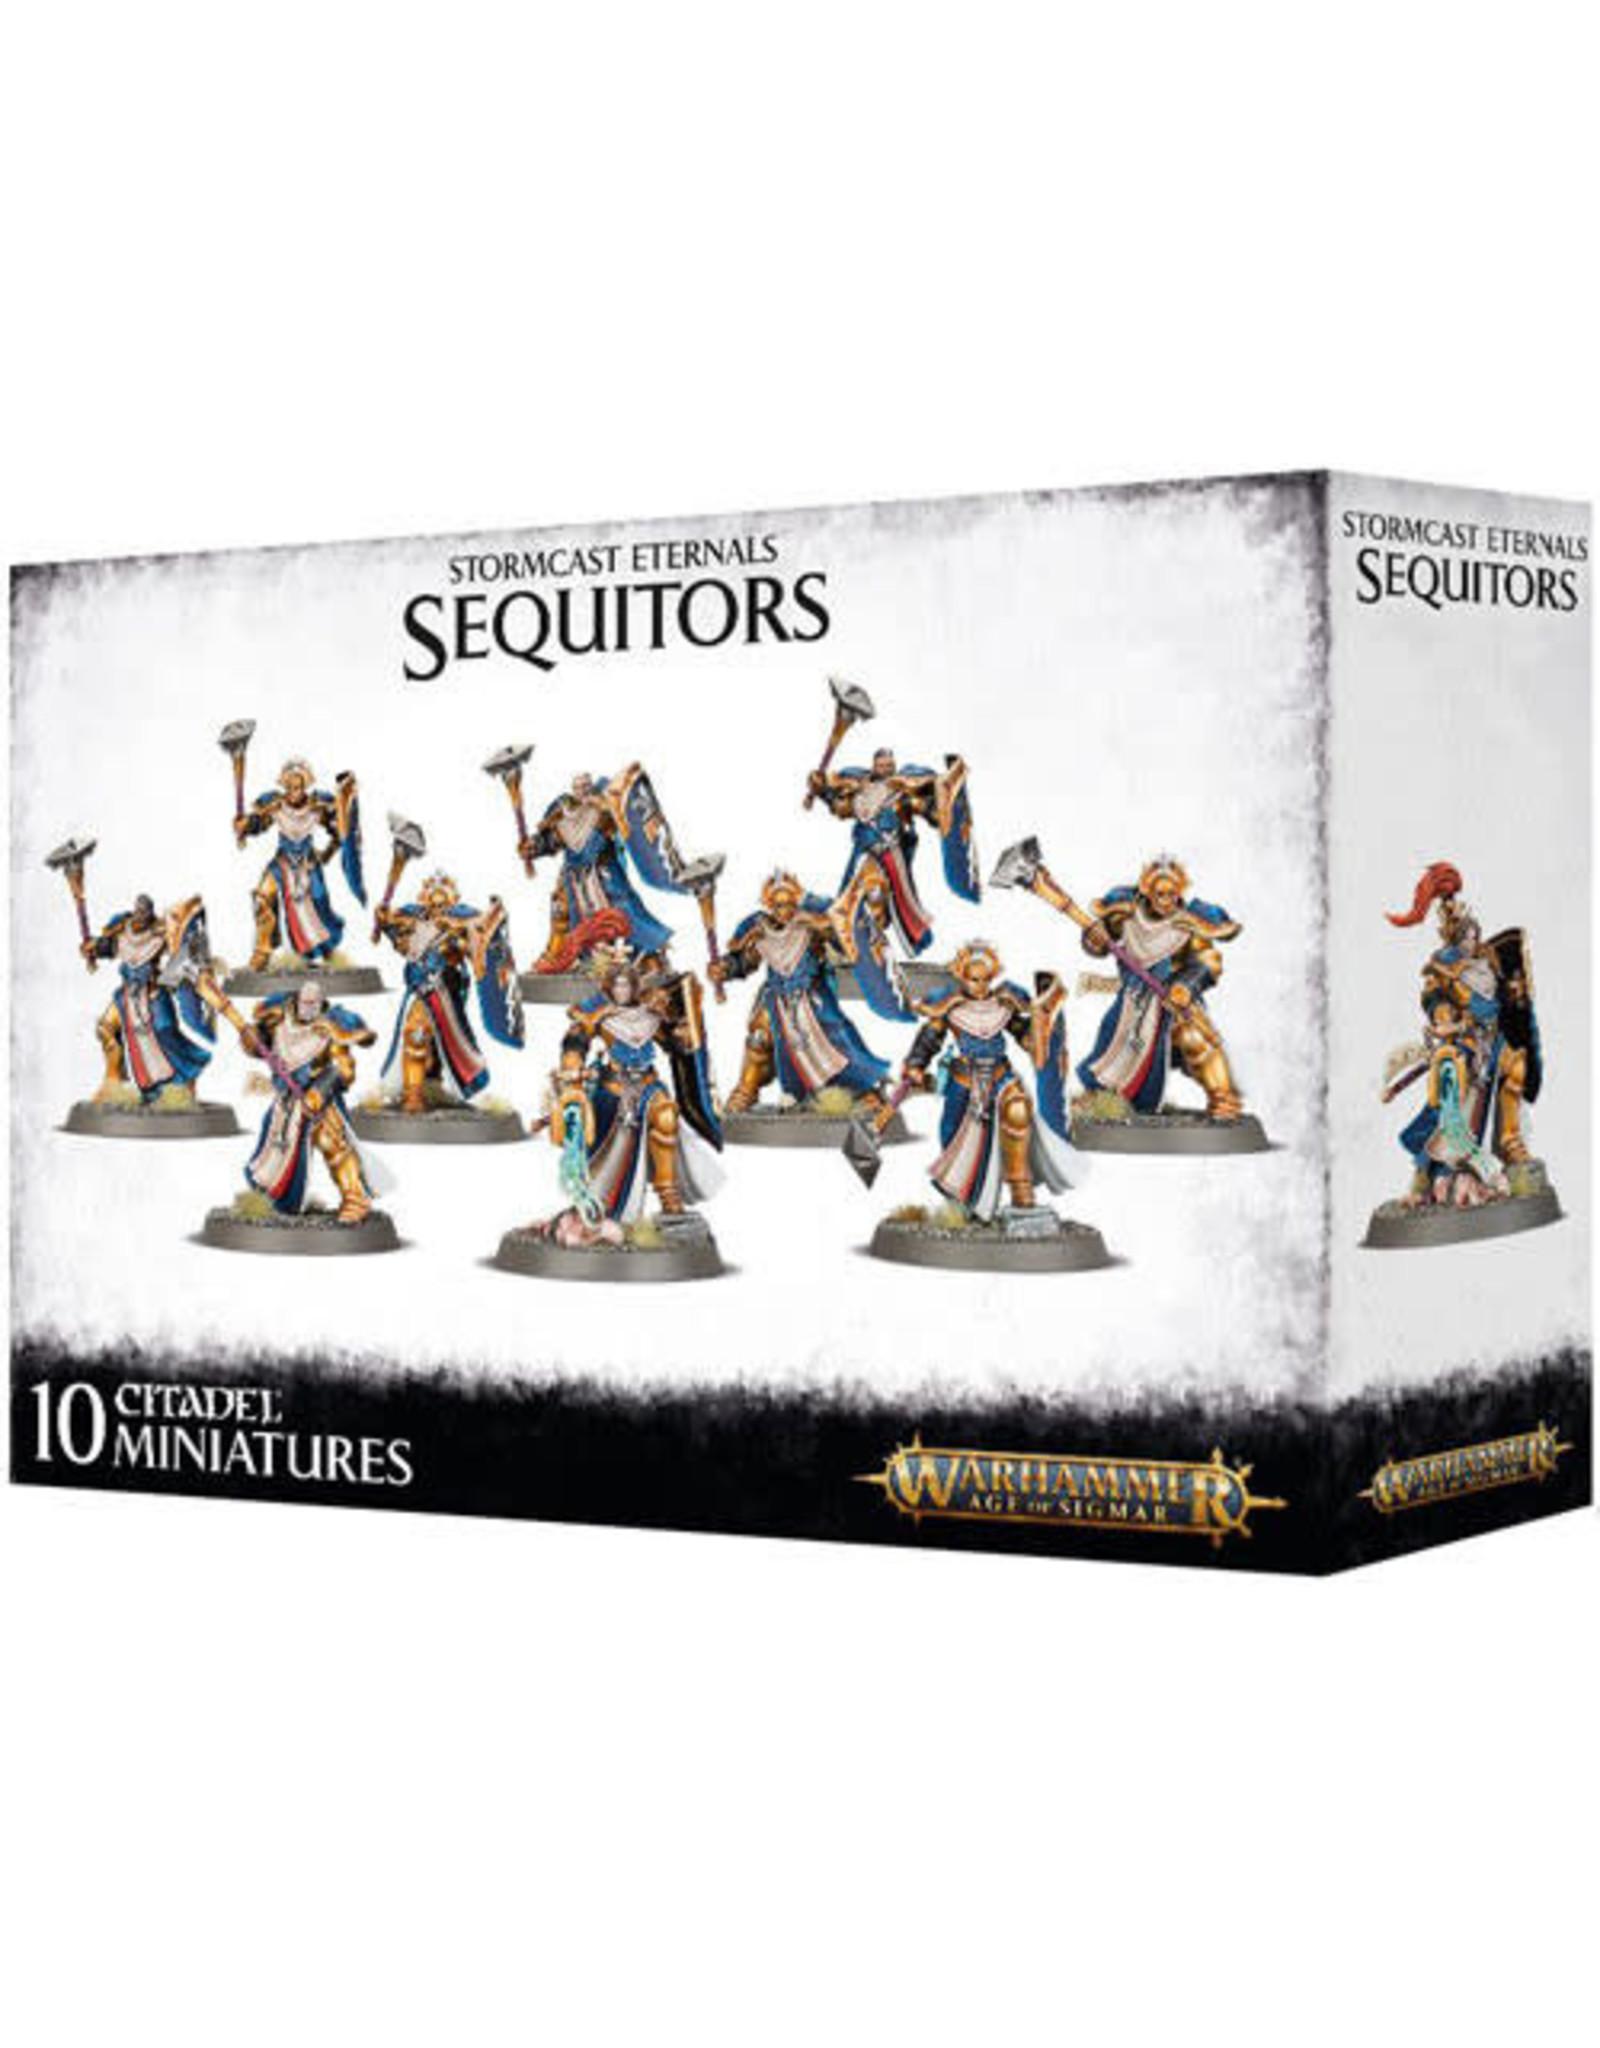 Warhammer Age of Sigmar Stormcast Eternals: Sequitors